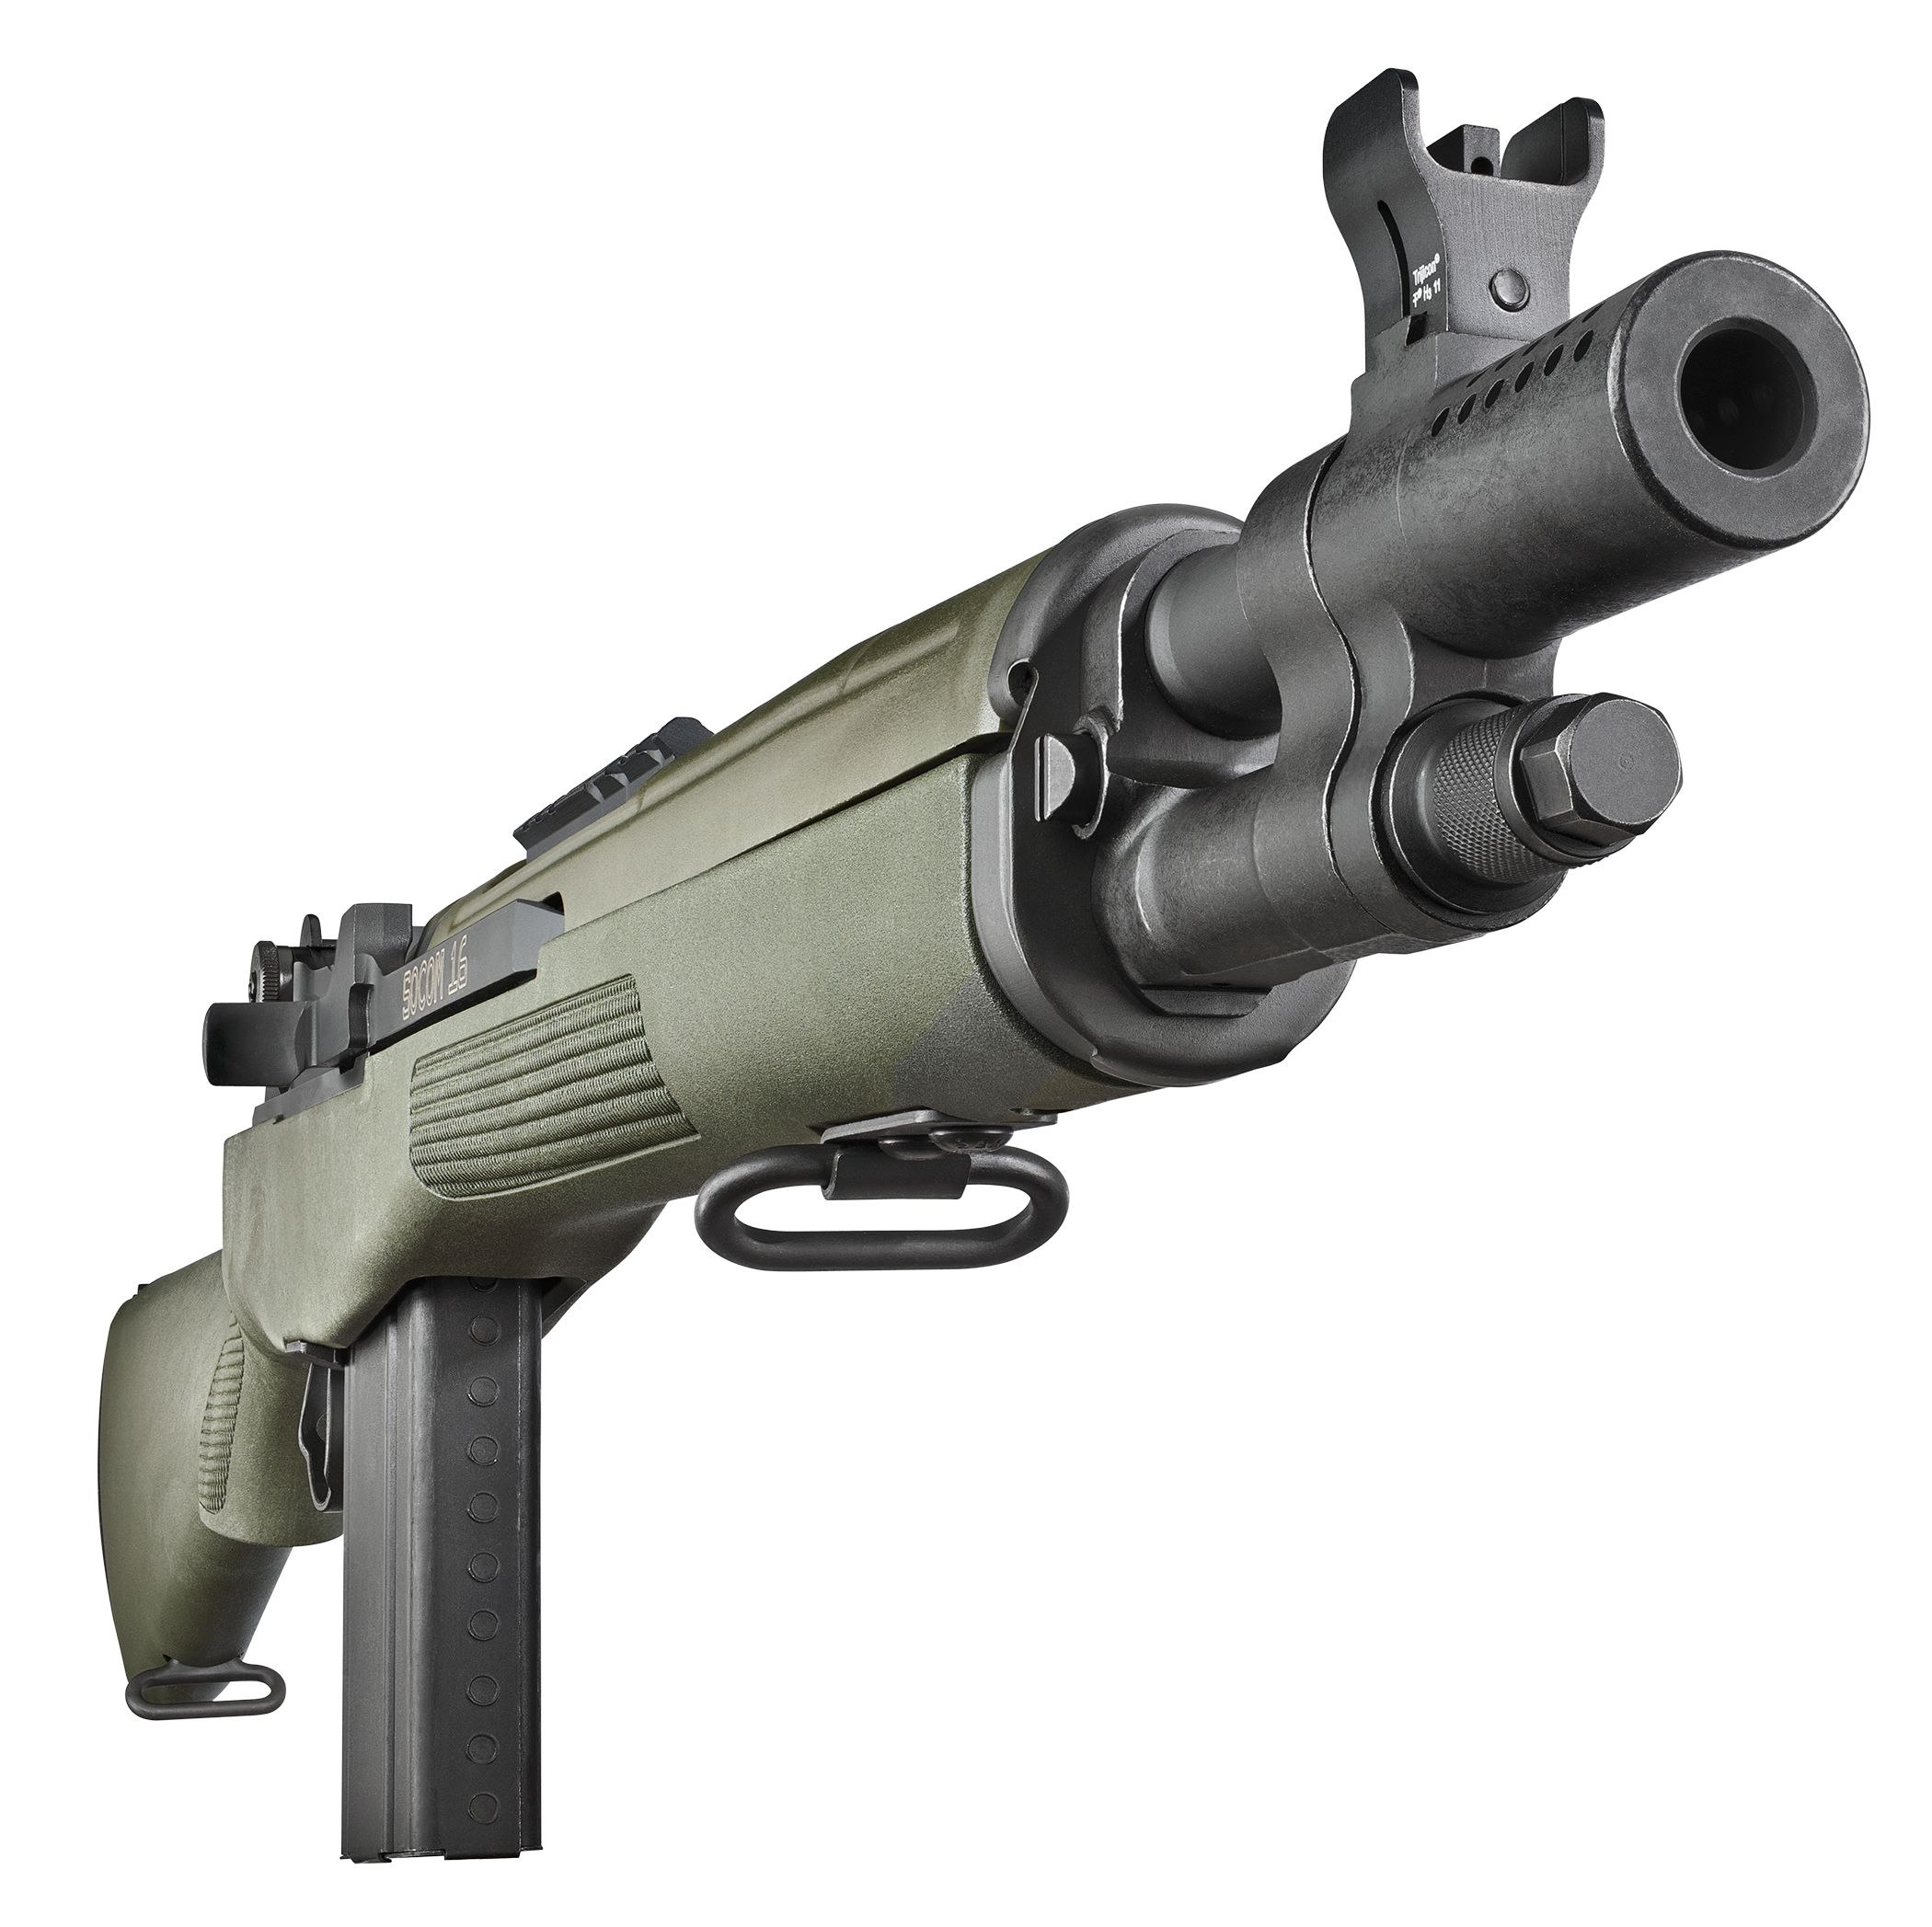 Pin on Centerfire Rifles